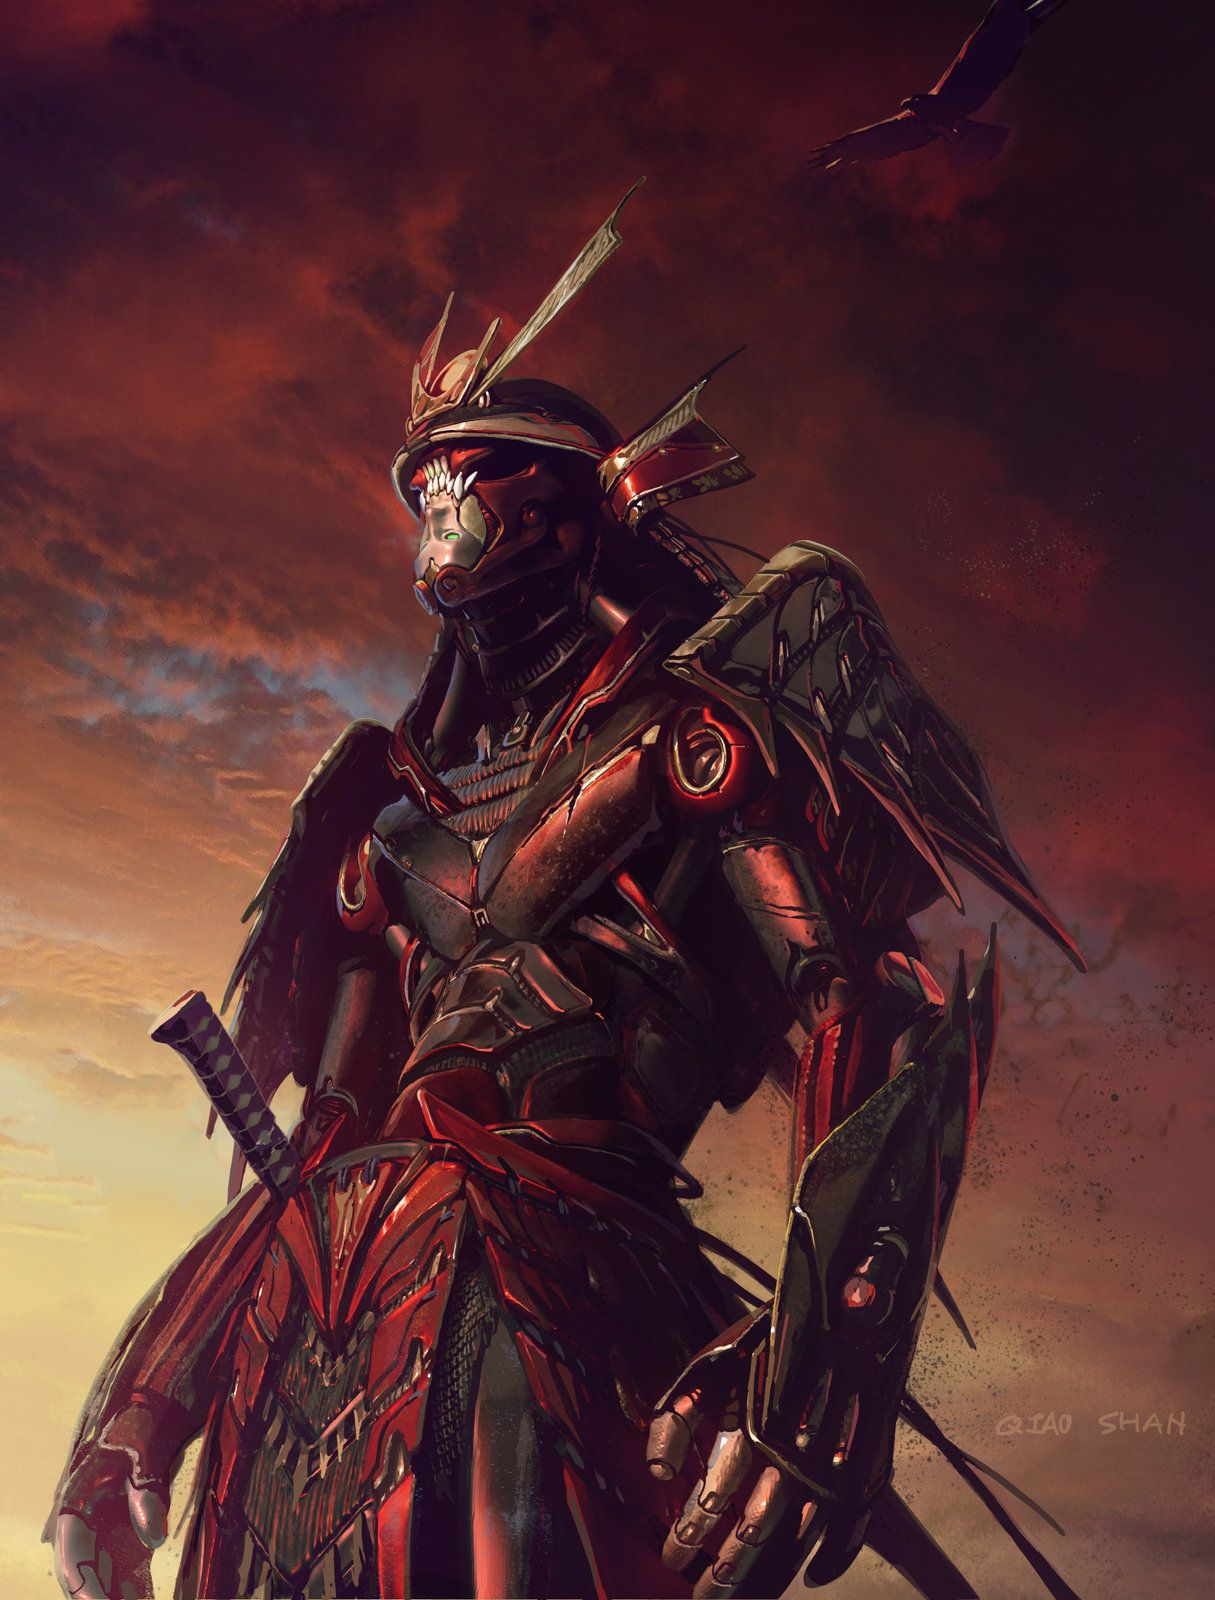 ArtStation - Male Samurai Concept Art, Murilo Miranda